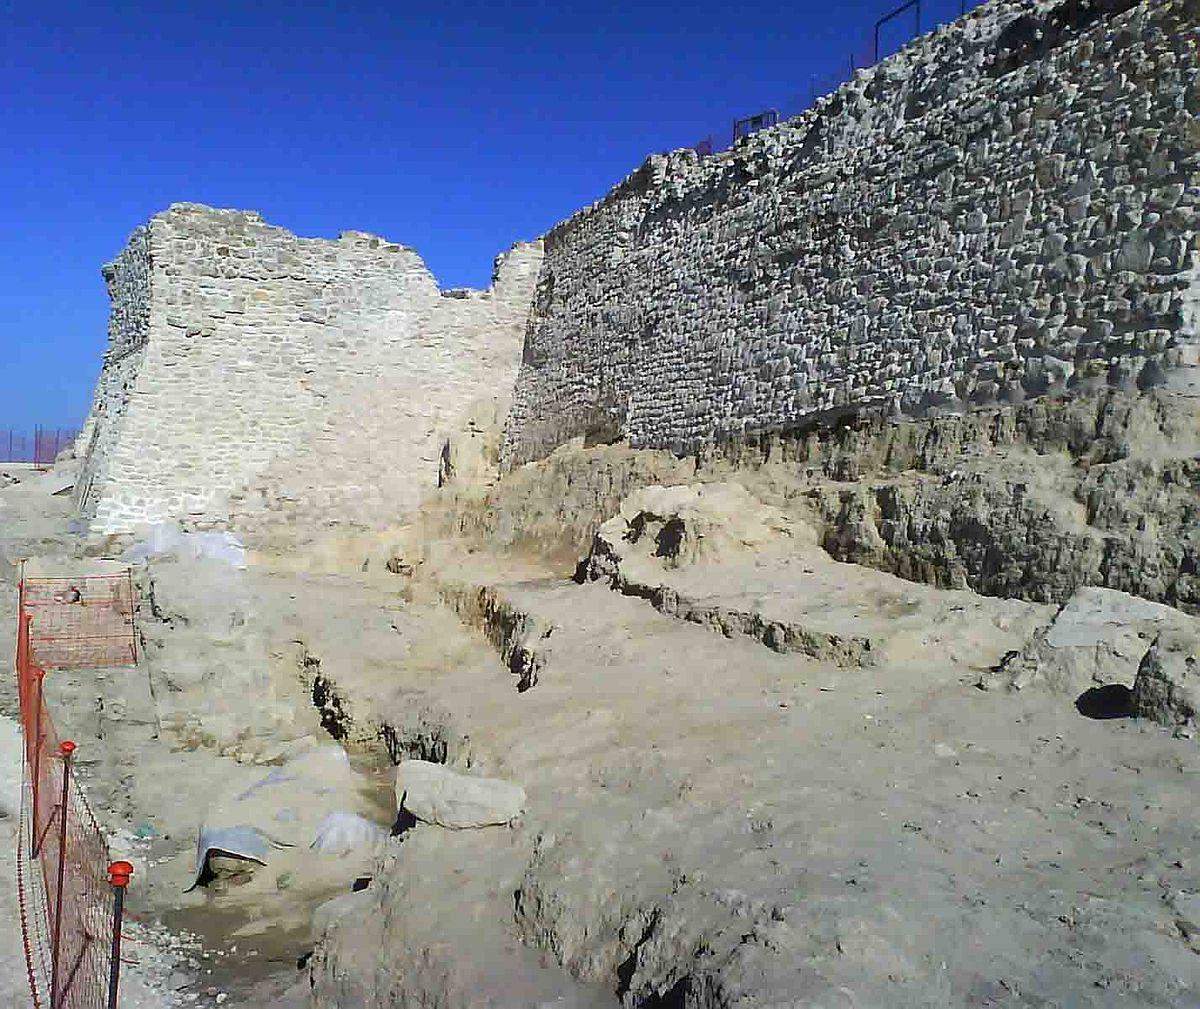 Castillo de medina sidonia wikipedia la enciclopedia libre - Eltiempo es medina sidonia ...